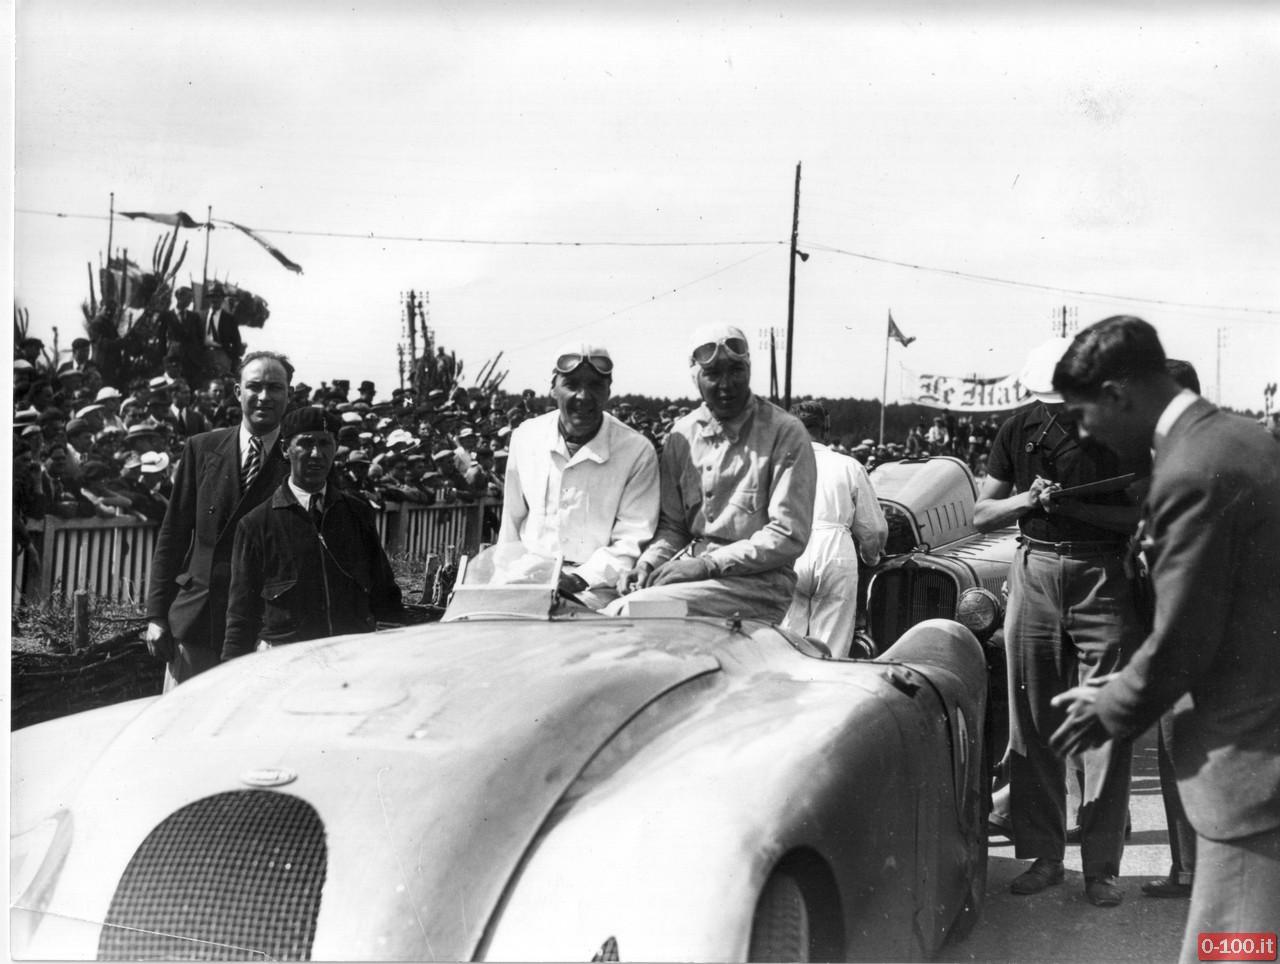 bugatti-veyron-legend-jean-pierre-wimille-0-100_12